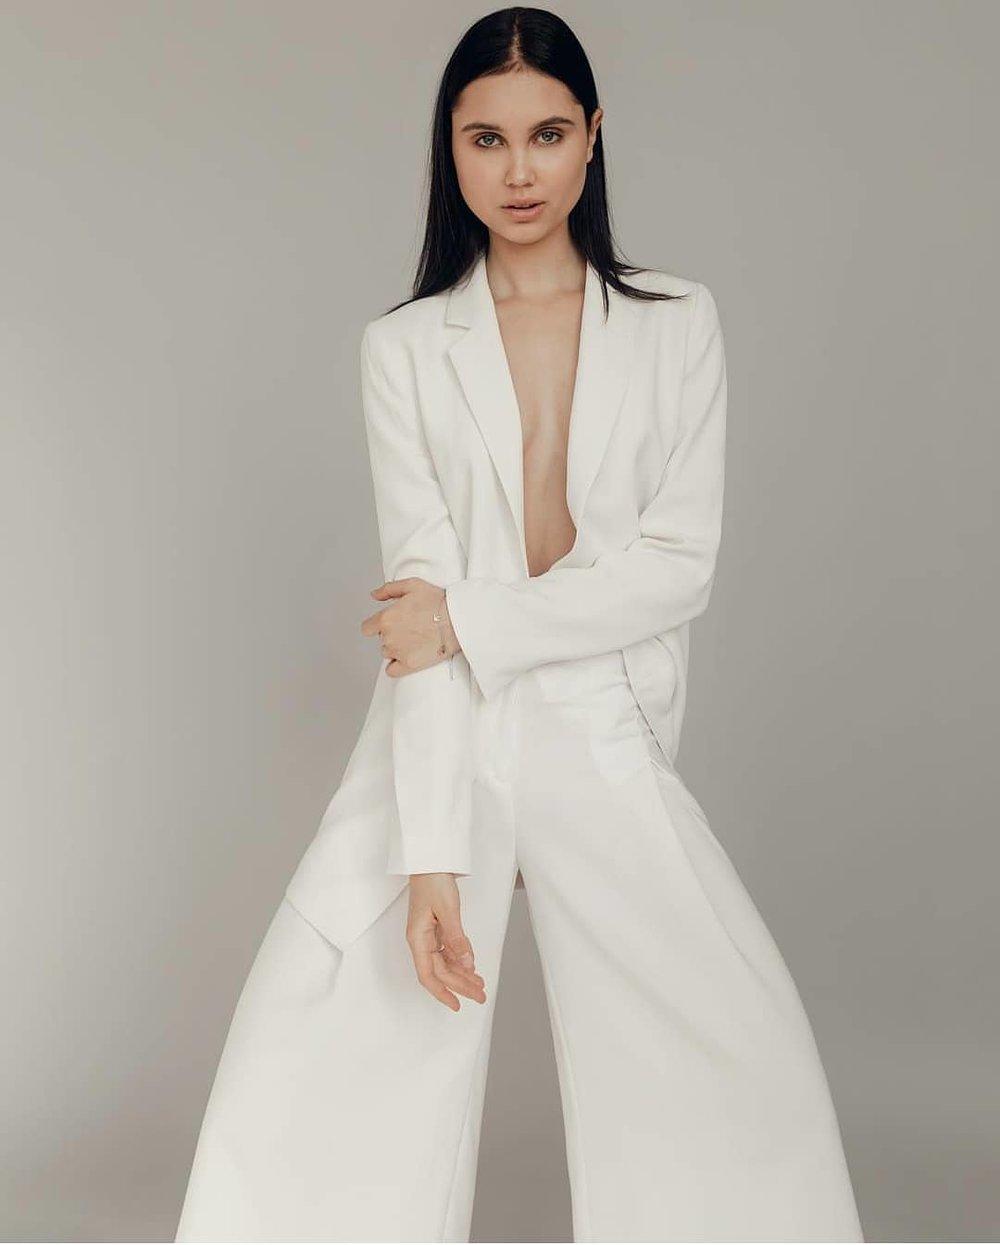 Photographer   David Urbanke   Model   Nastya Swan